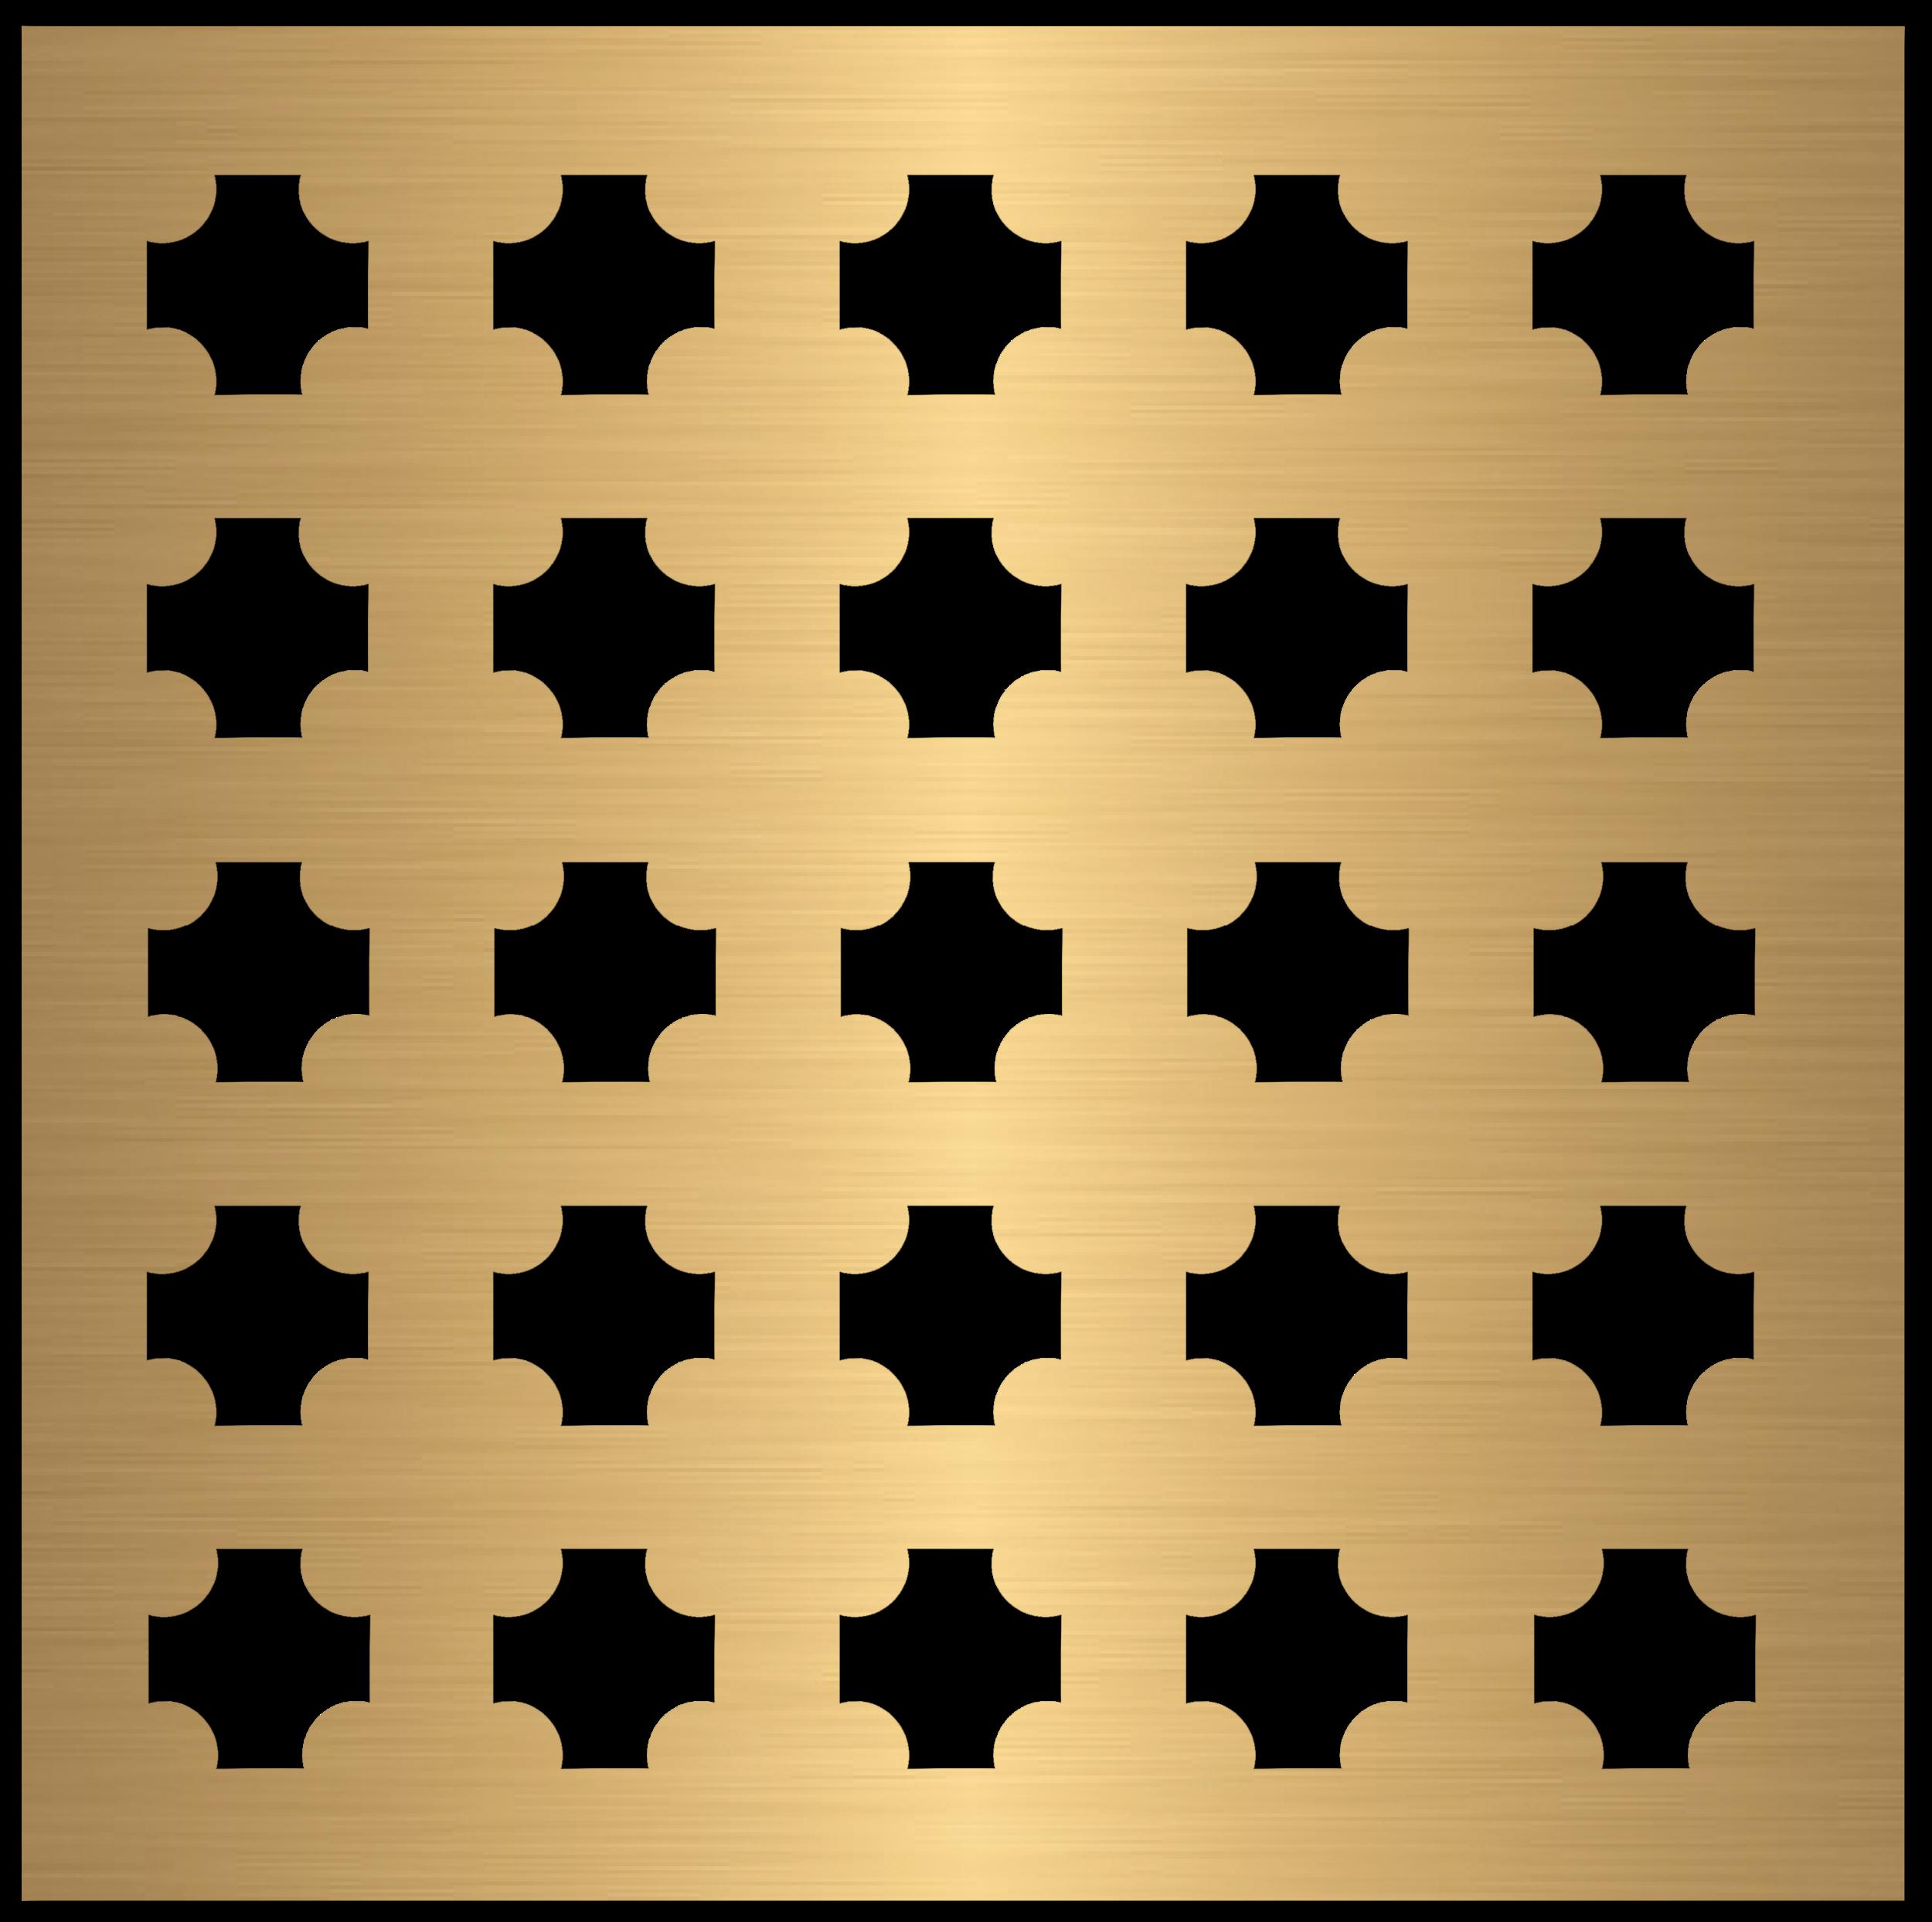 711 Square Cross